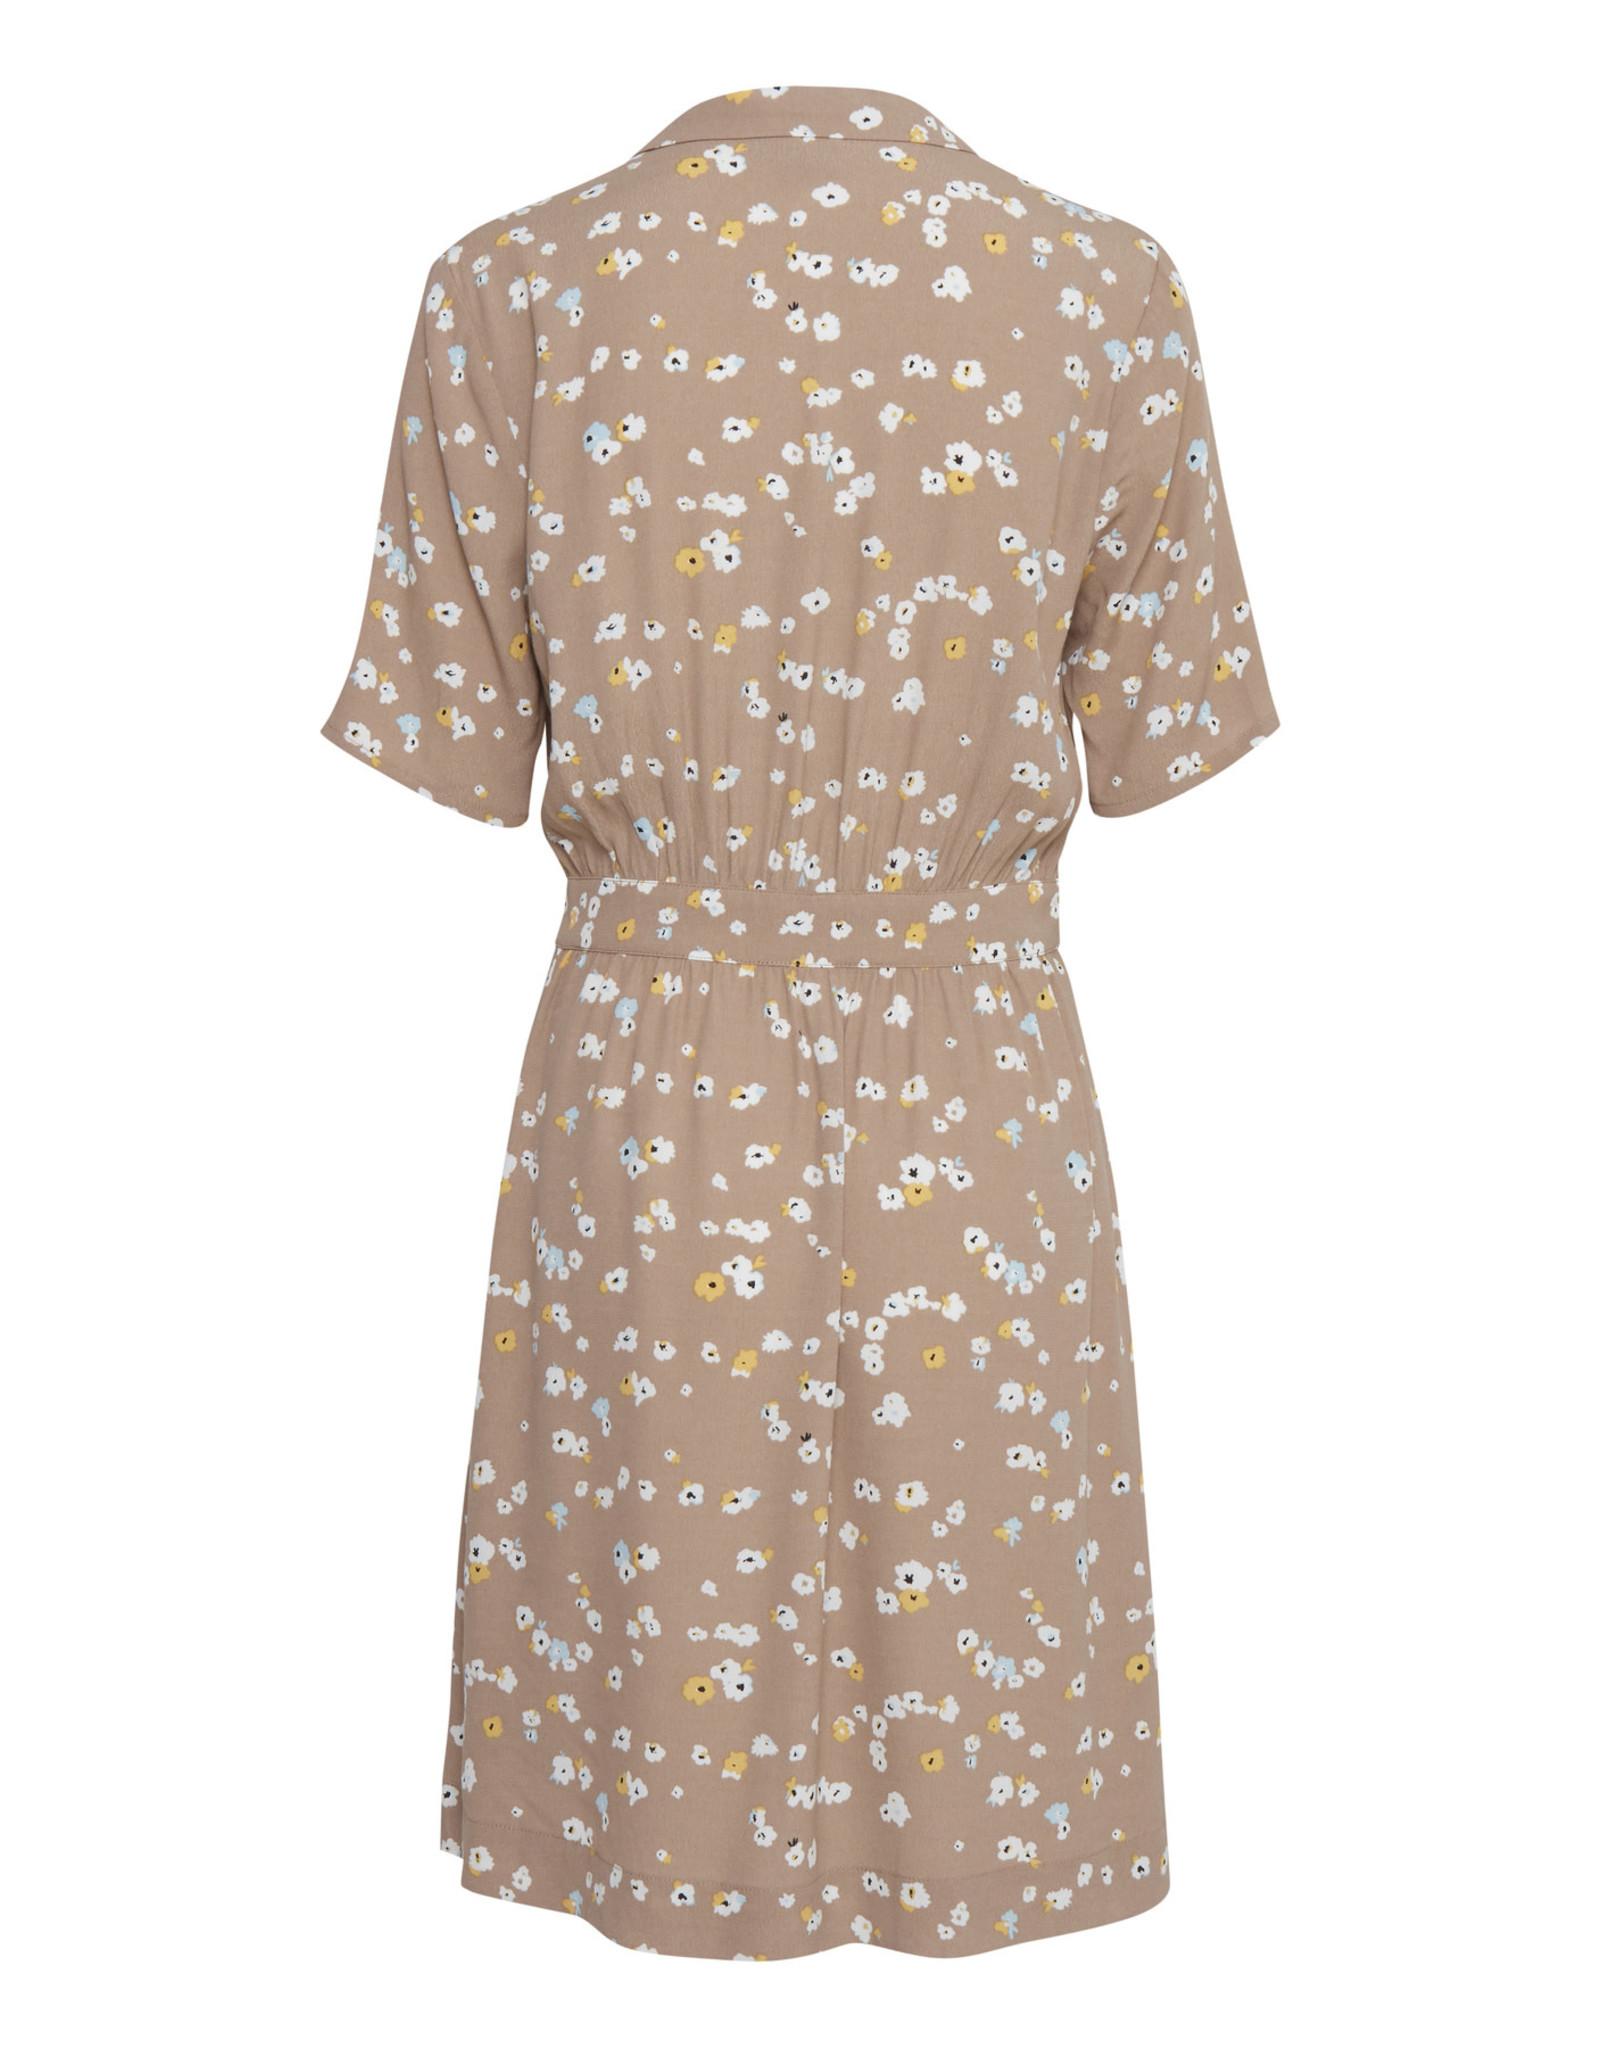 ICHI ICHI - Floral Print Dress